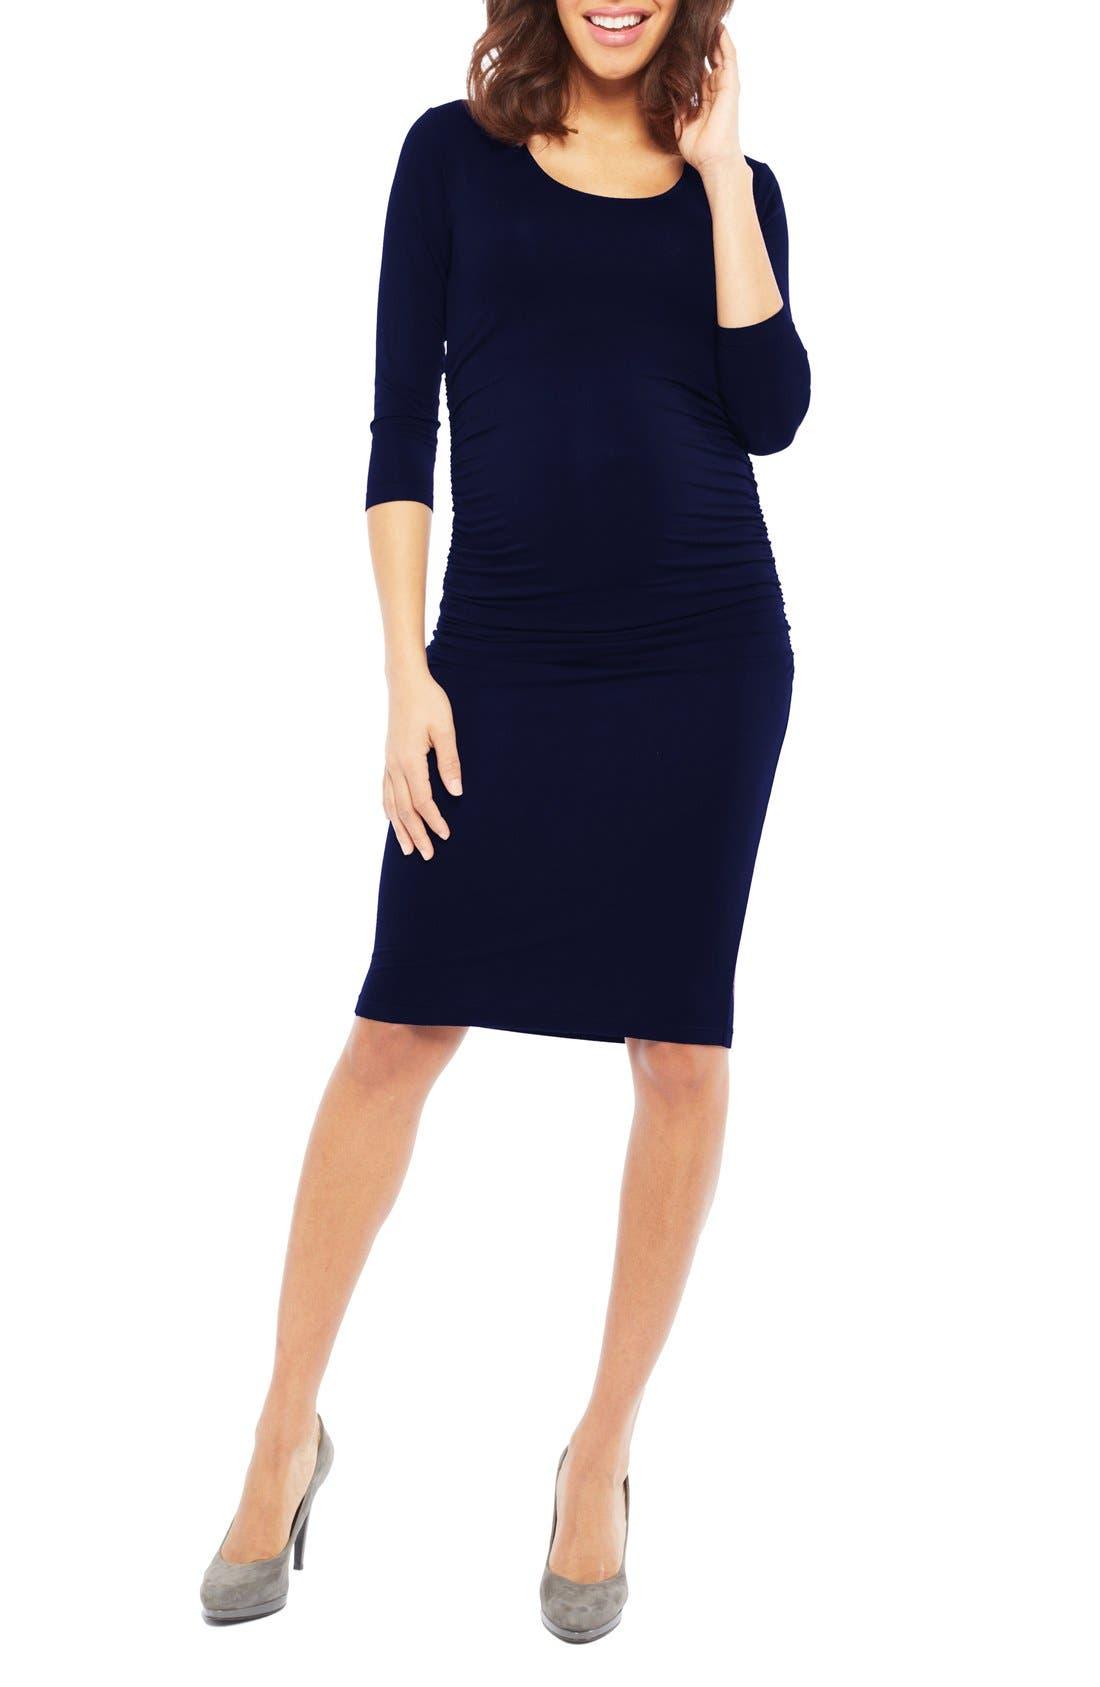 Nom 'Ellie' Ruched Maternity Dress,                         Main,                         color, Navy